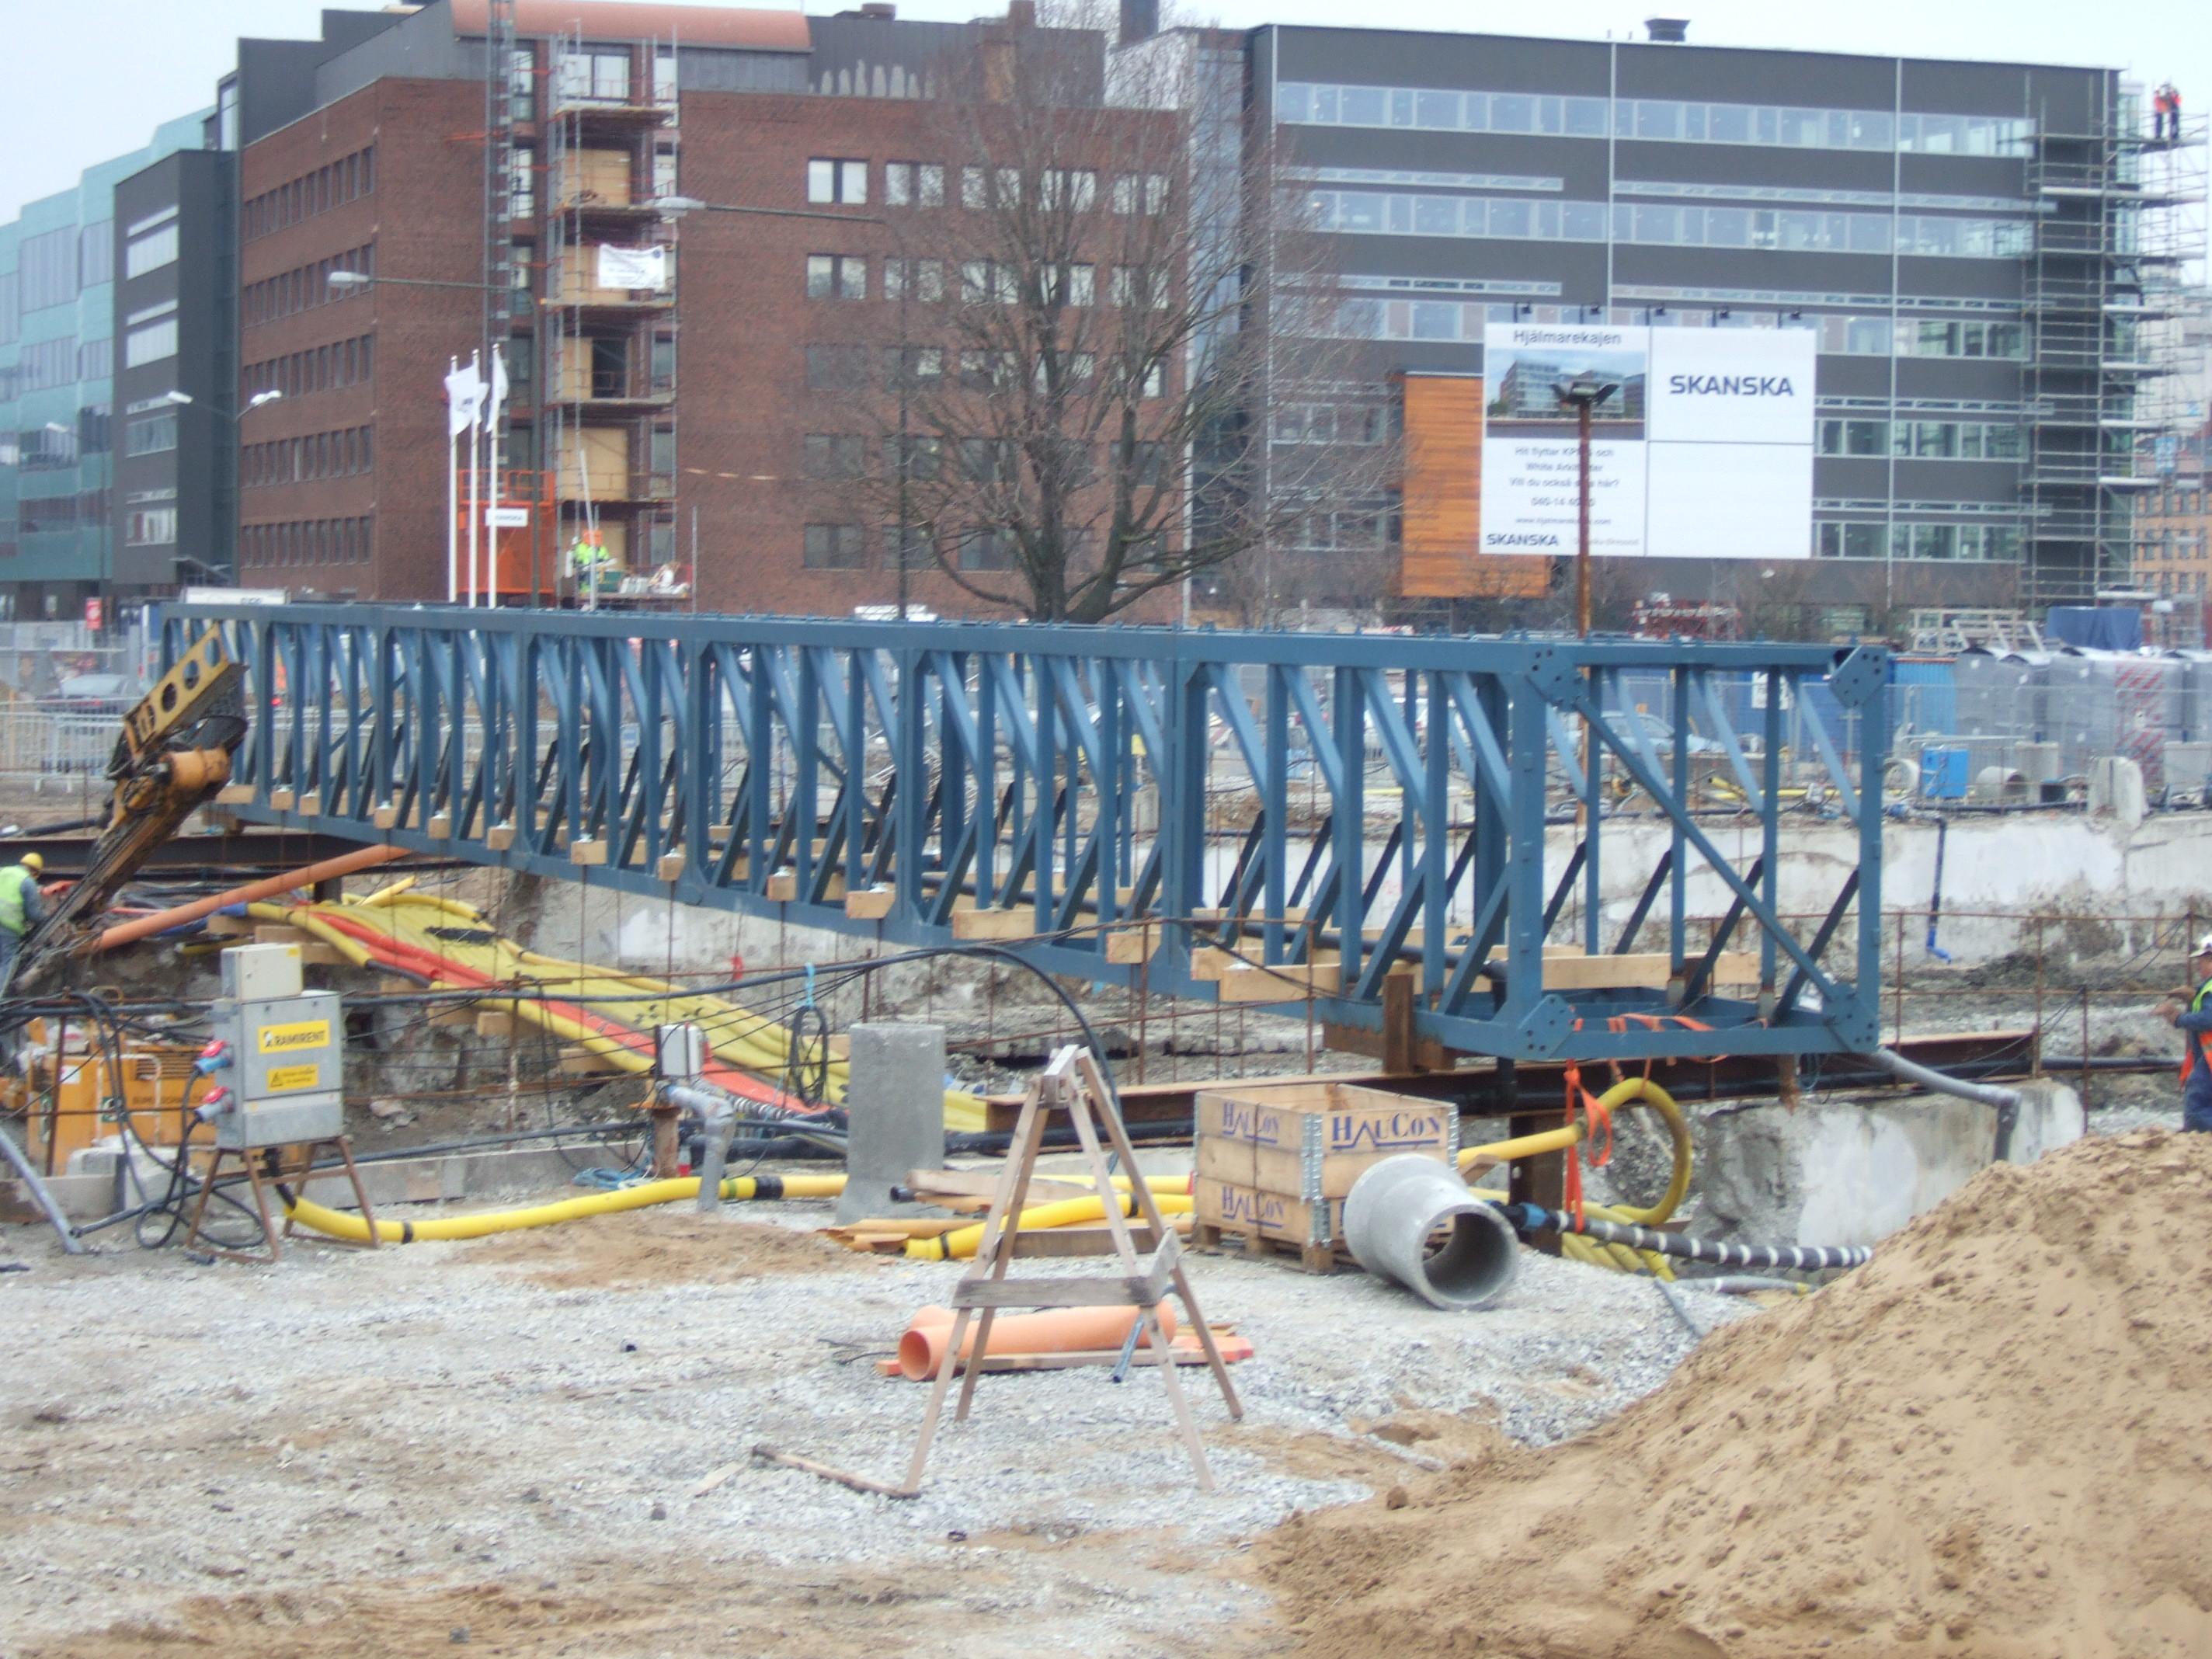 tabus building construction site meta walkway royalty